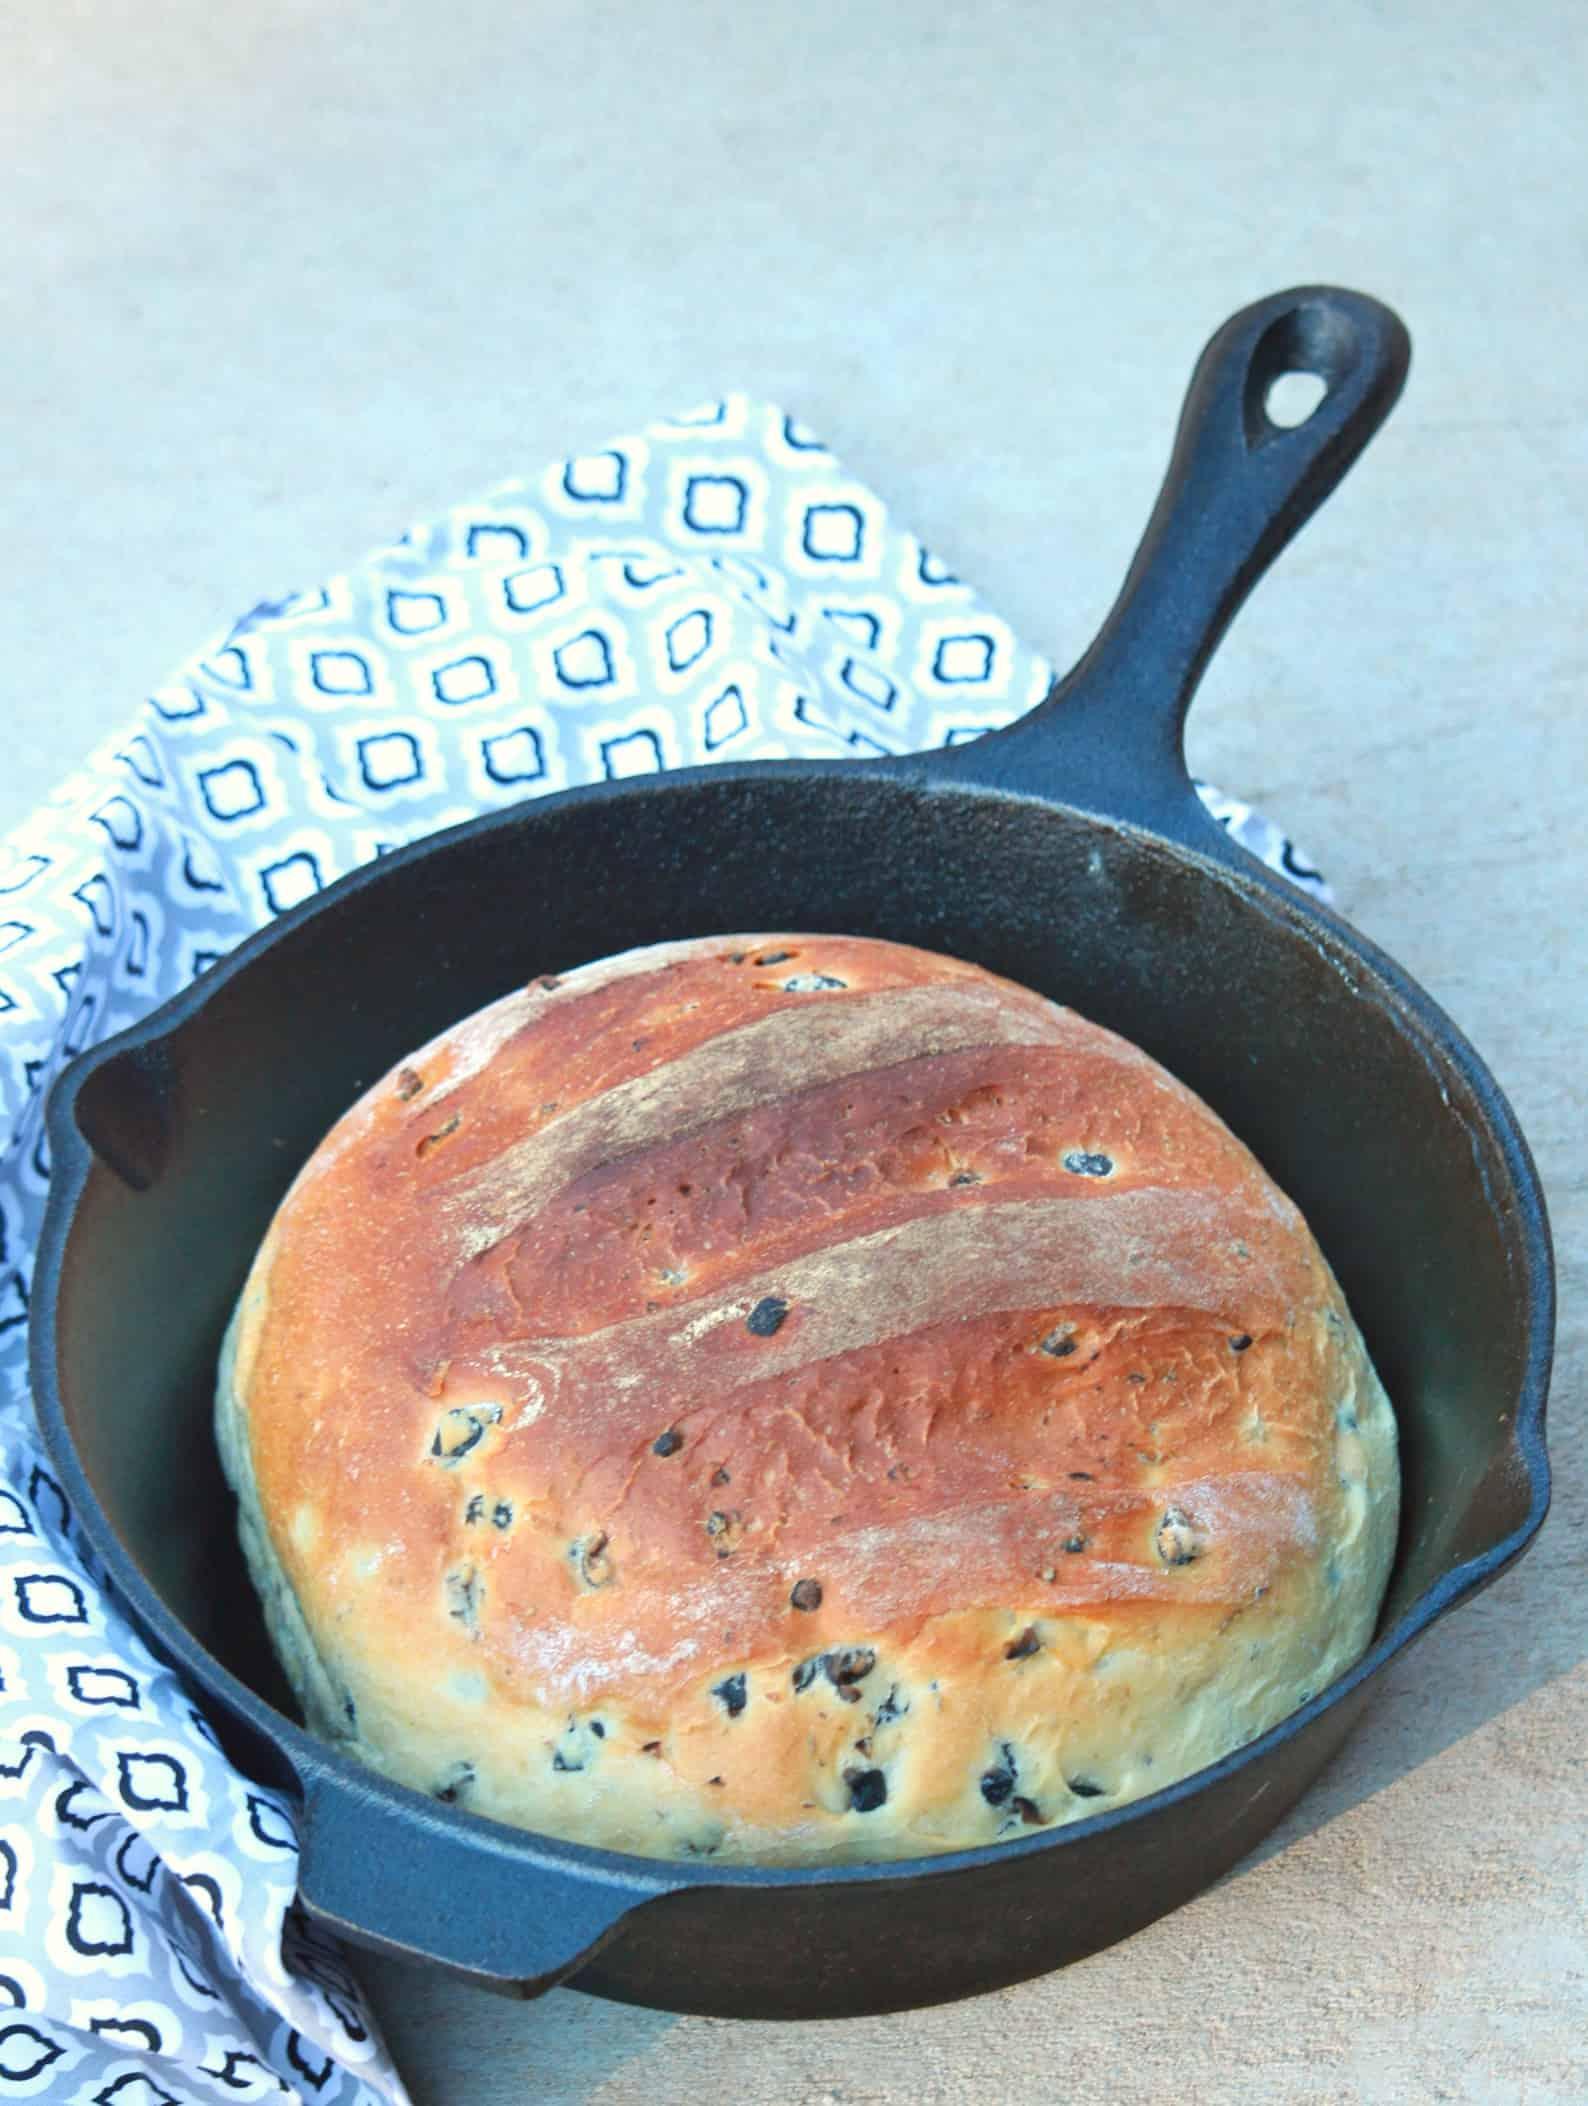 Moroccan Olive Bread – Vegan Olive Bread